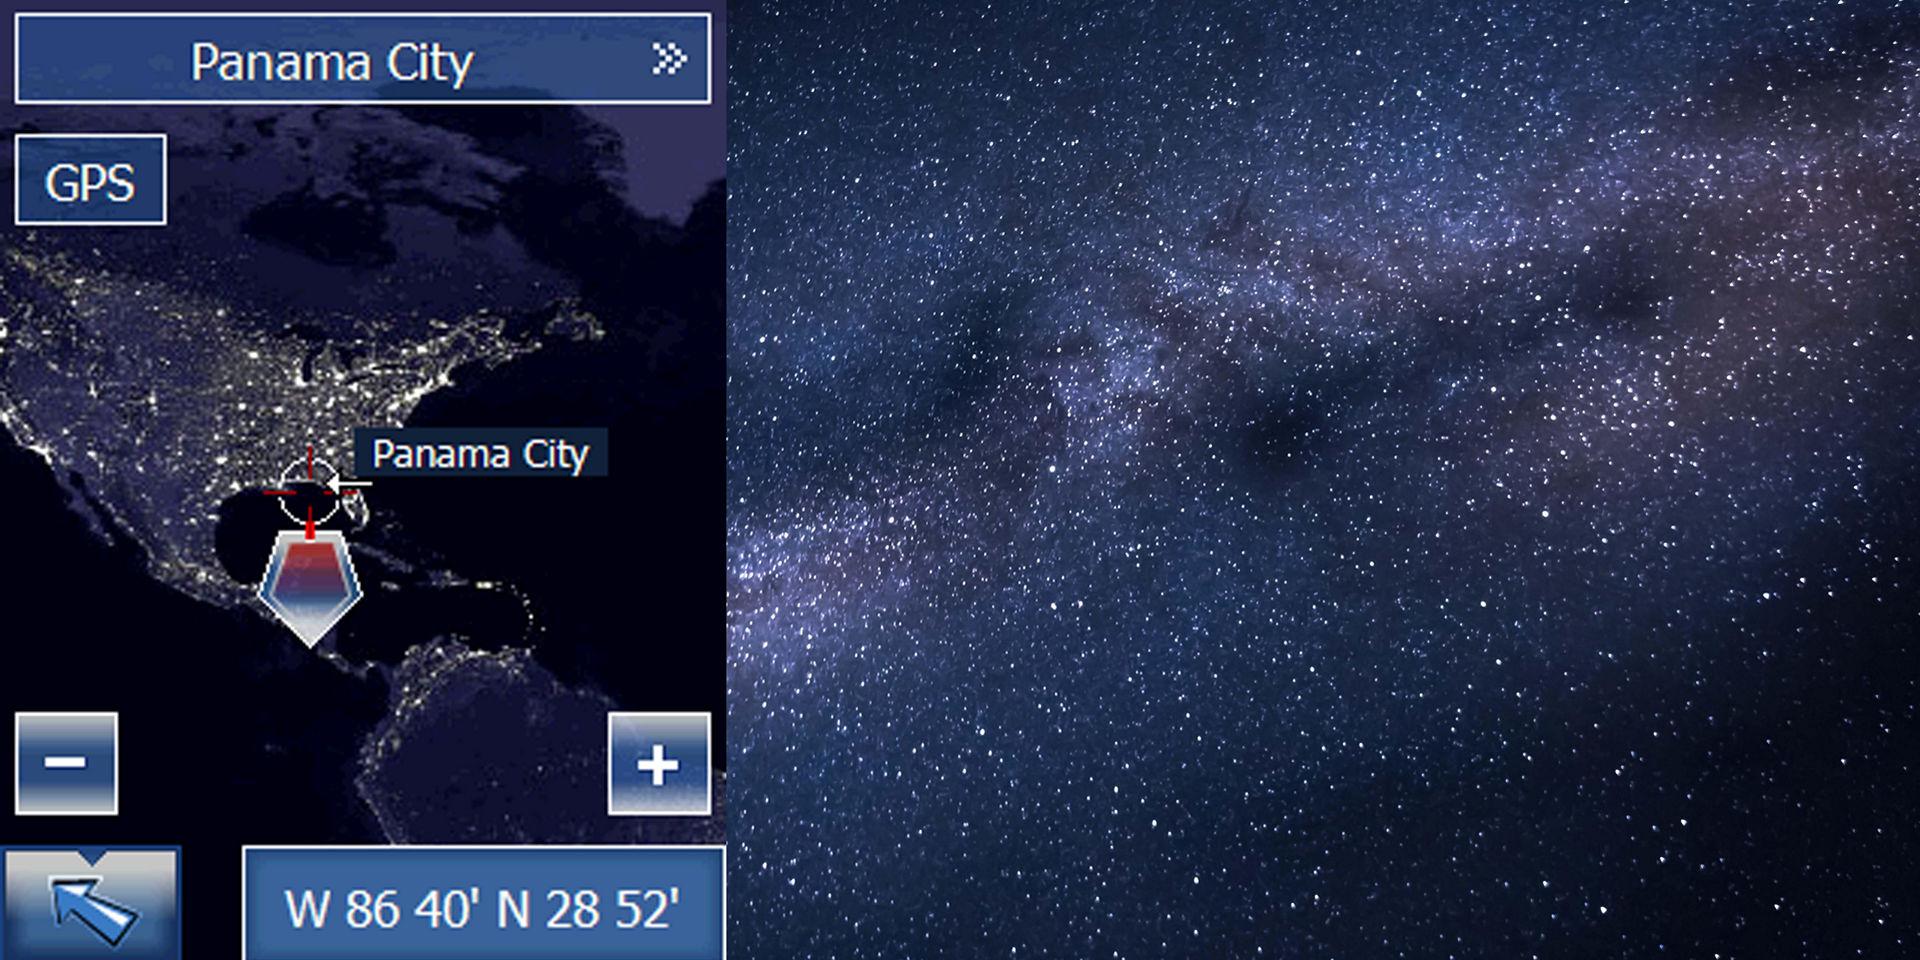 The first stargazing app